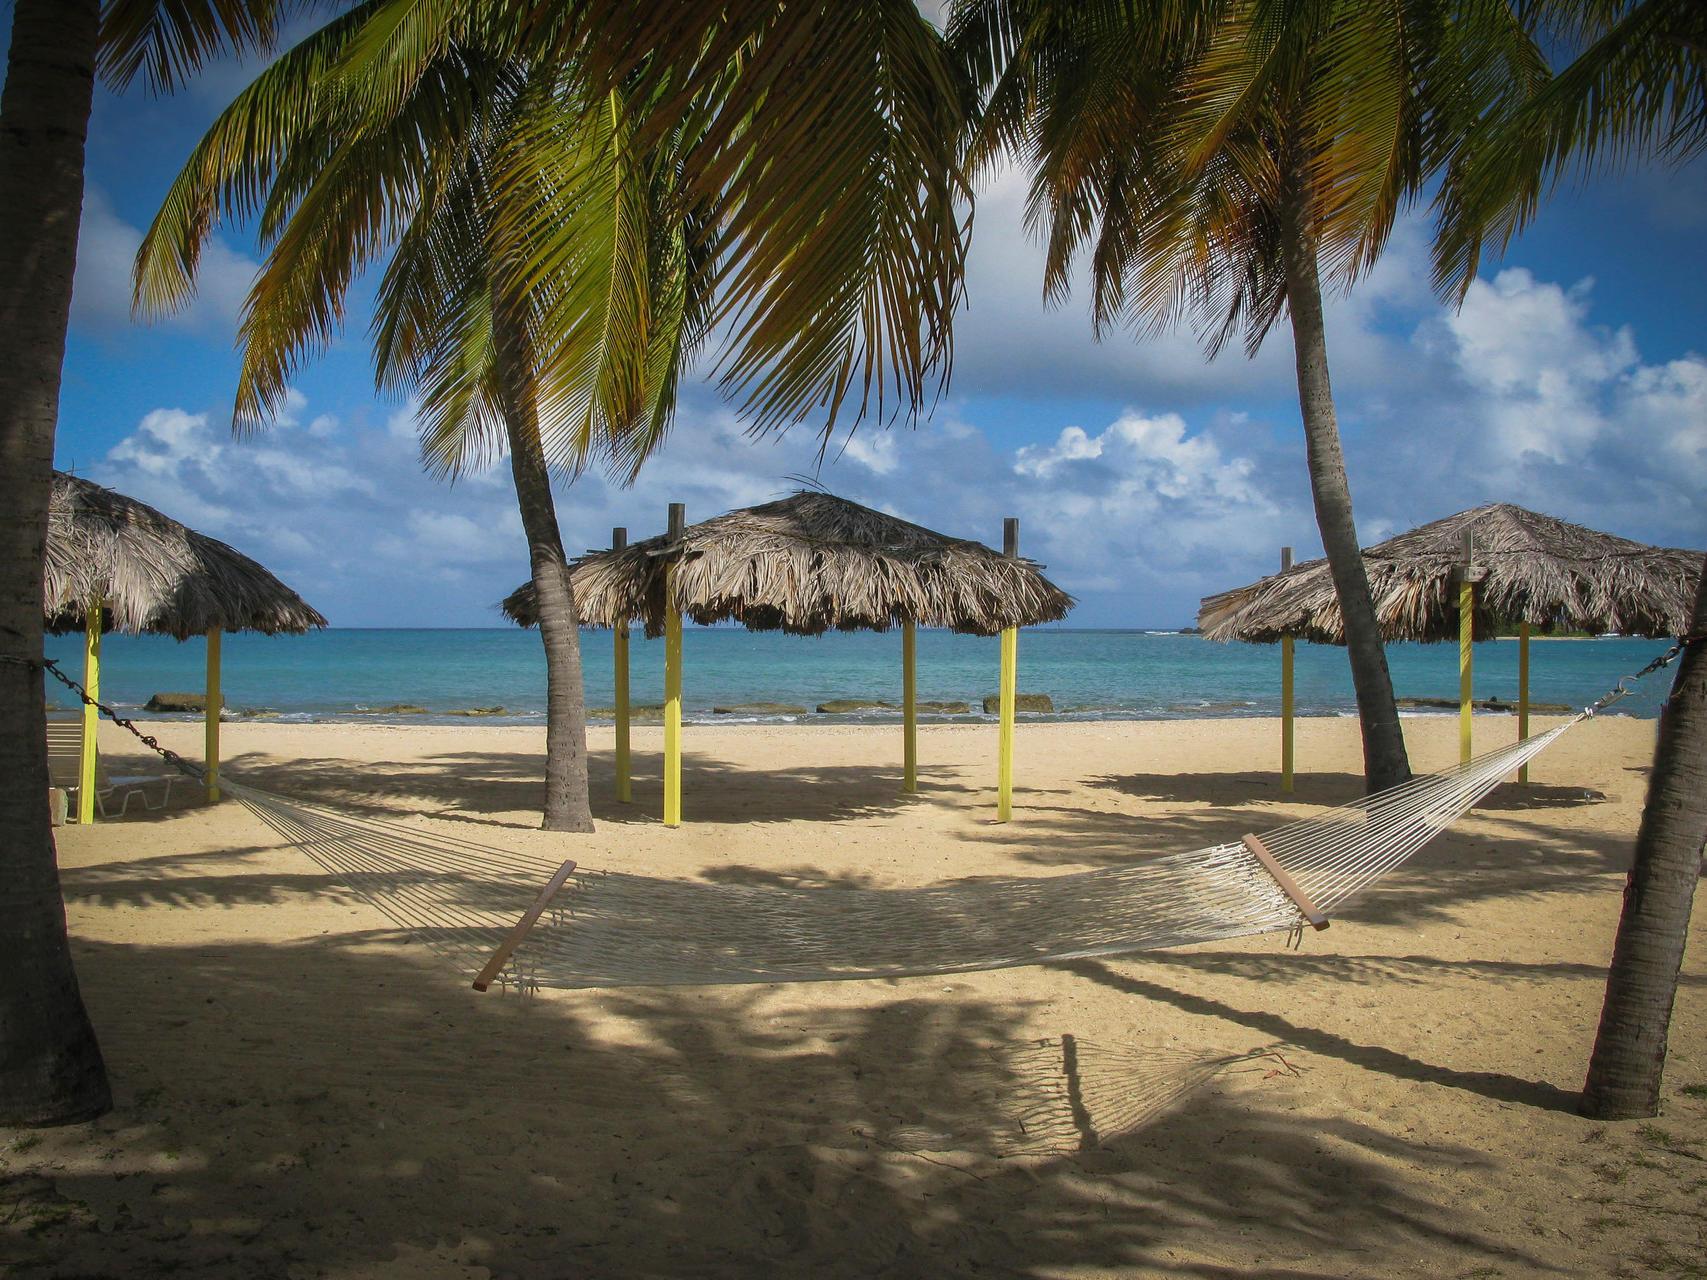 Hammock Tiki in the sea shore by beach at Tamarind Reef Resort